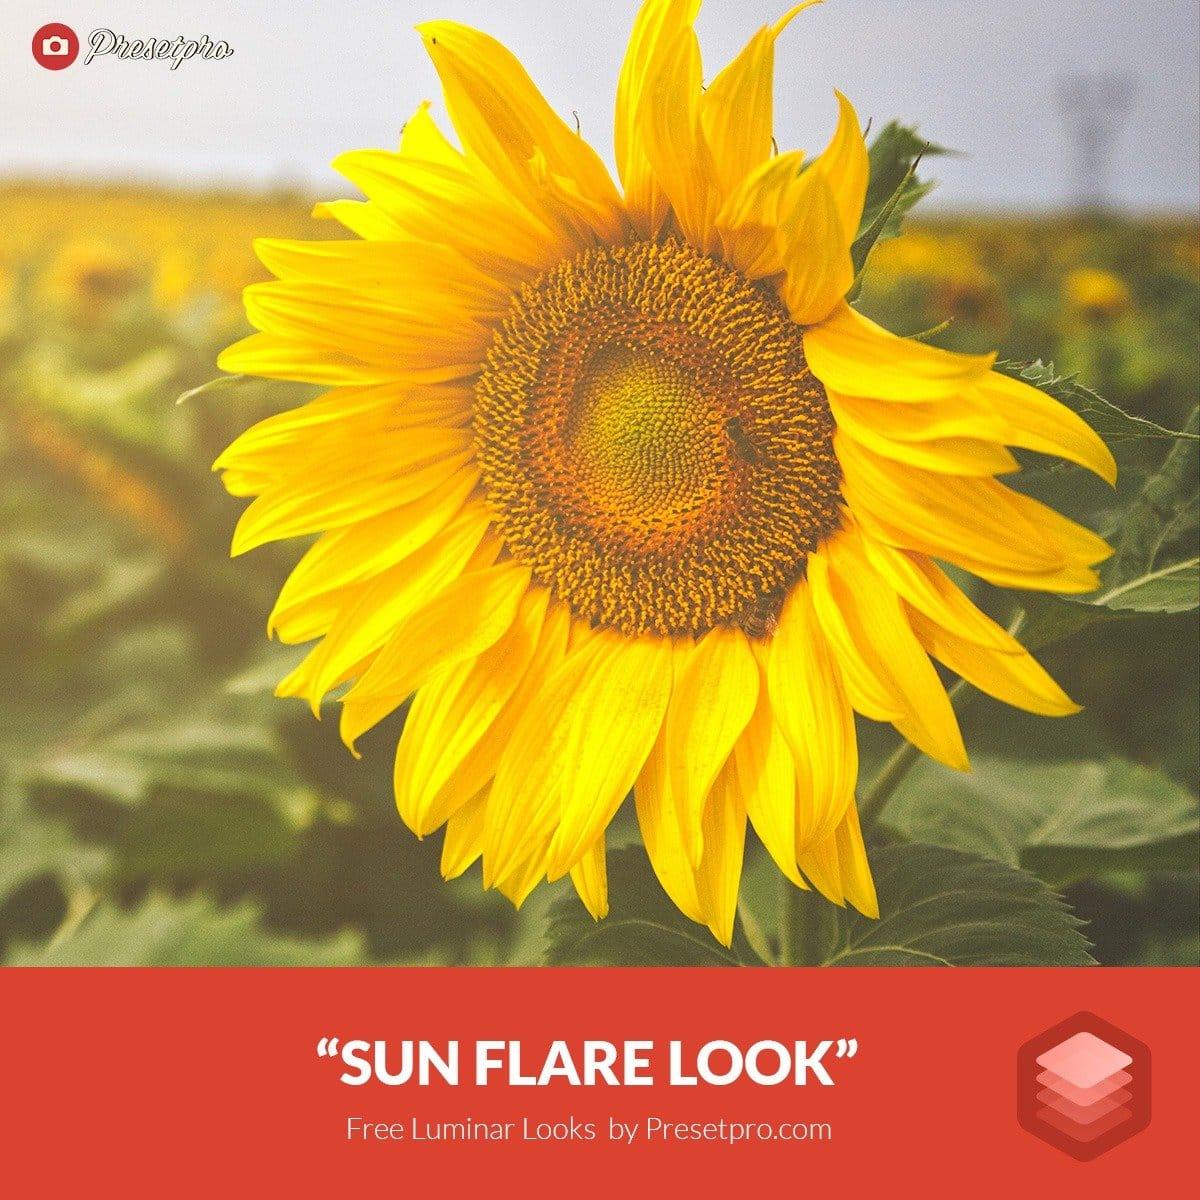 Free-Luminar-Look-Preset-Sunflare-Presetpro.com